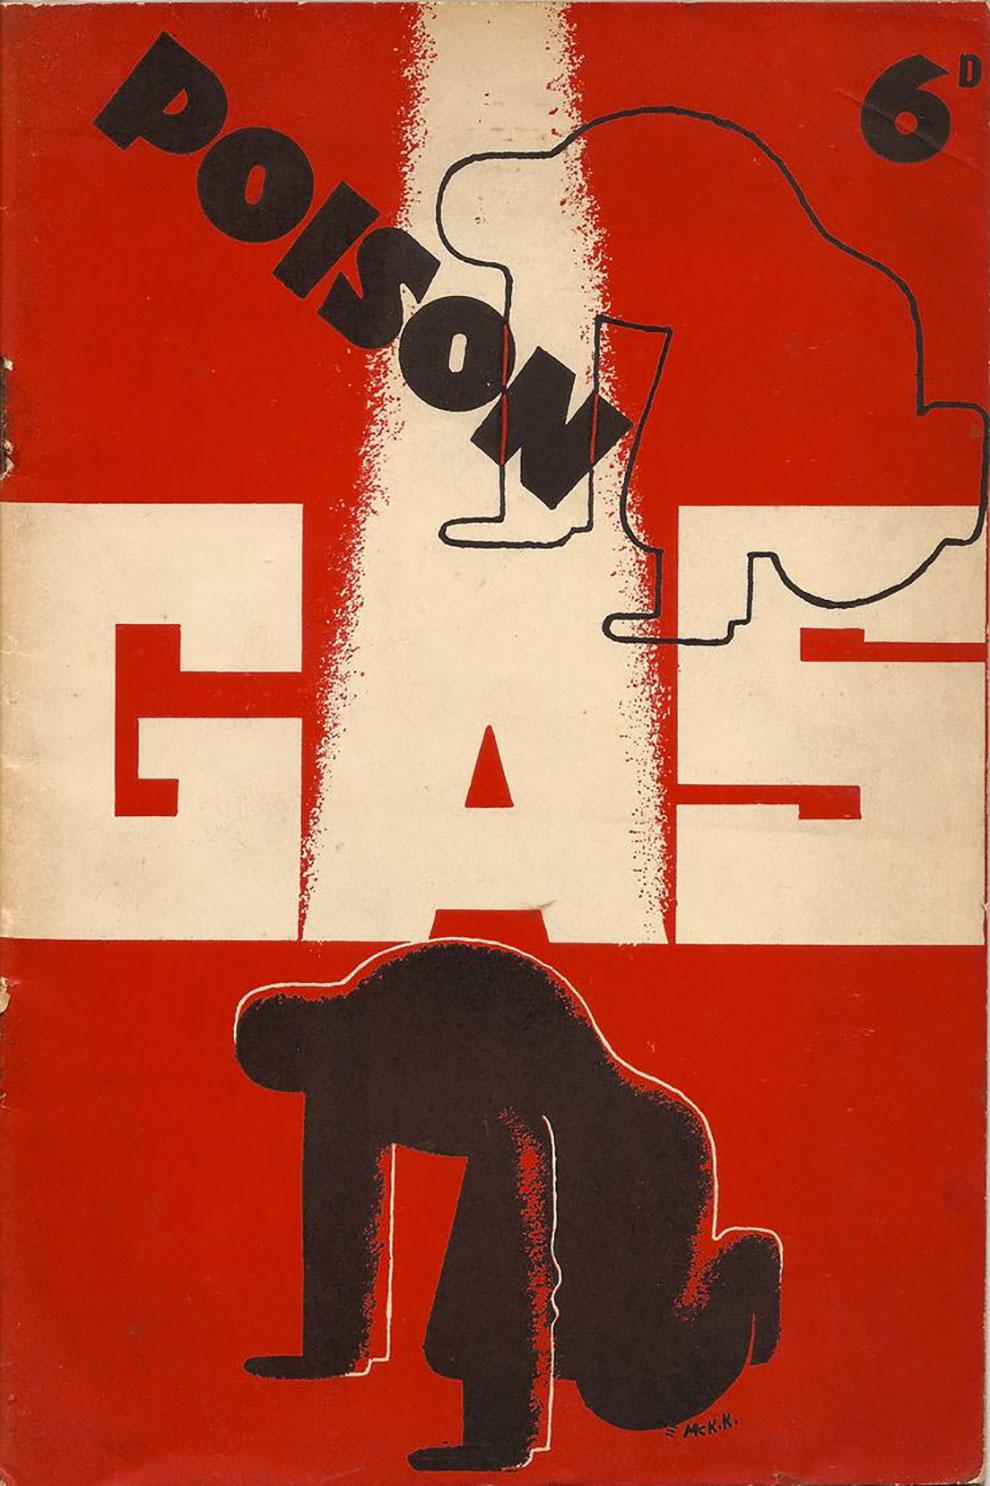 Edward-McKnight-Kauffer-poison-gas